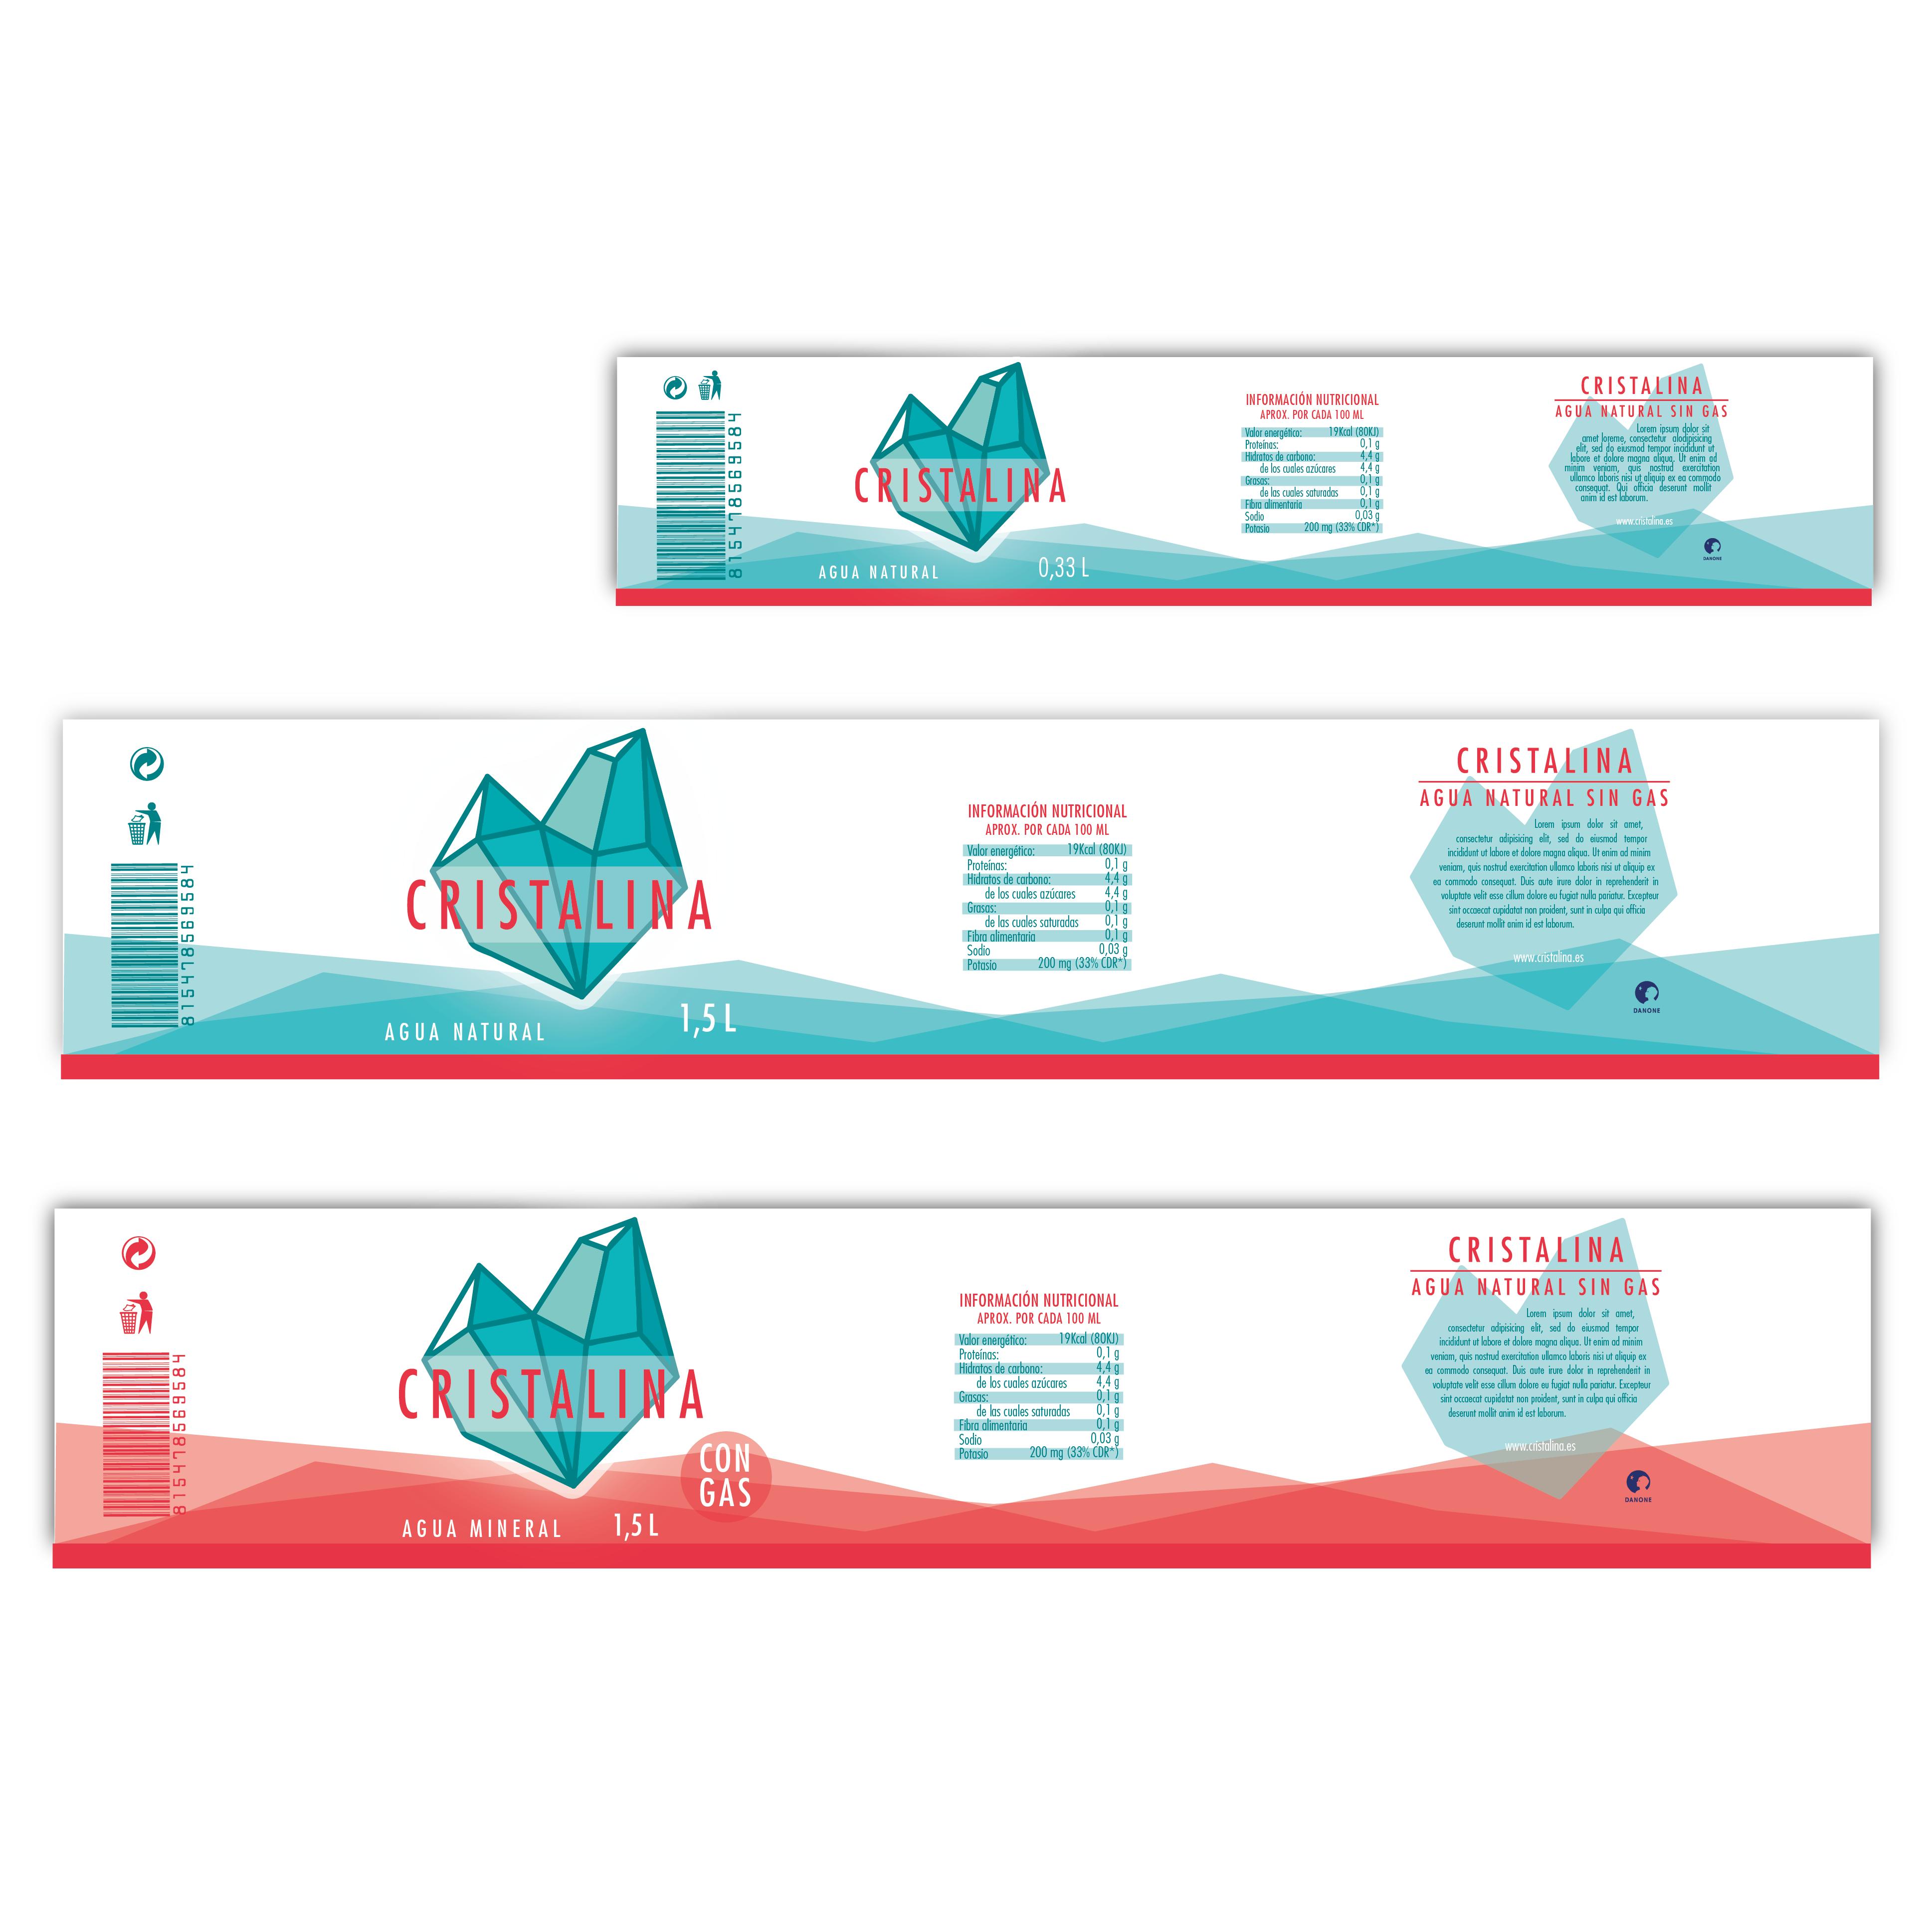 diseño y packaging agua cristalina